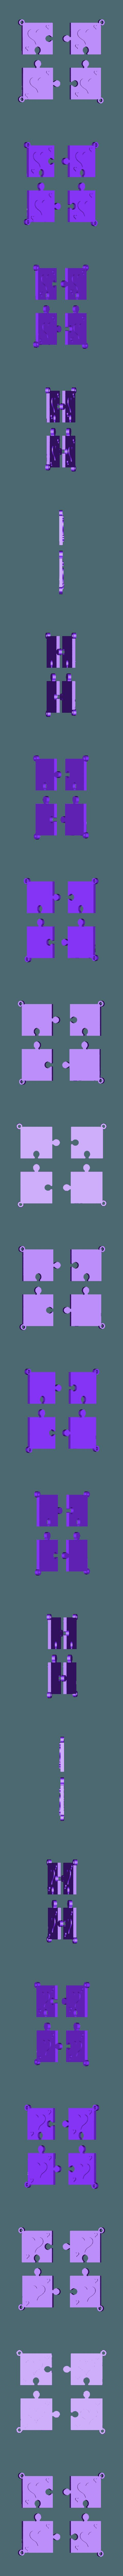 puzzle coeur.stl Download STL file puzzle key ring • 3D printing design, catf3d